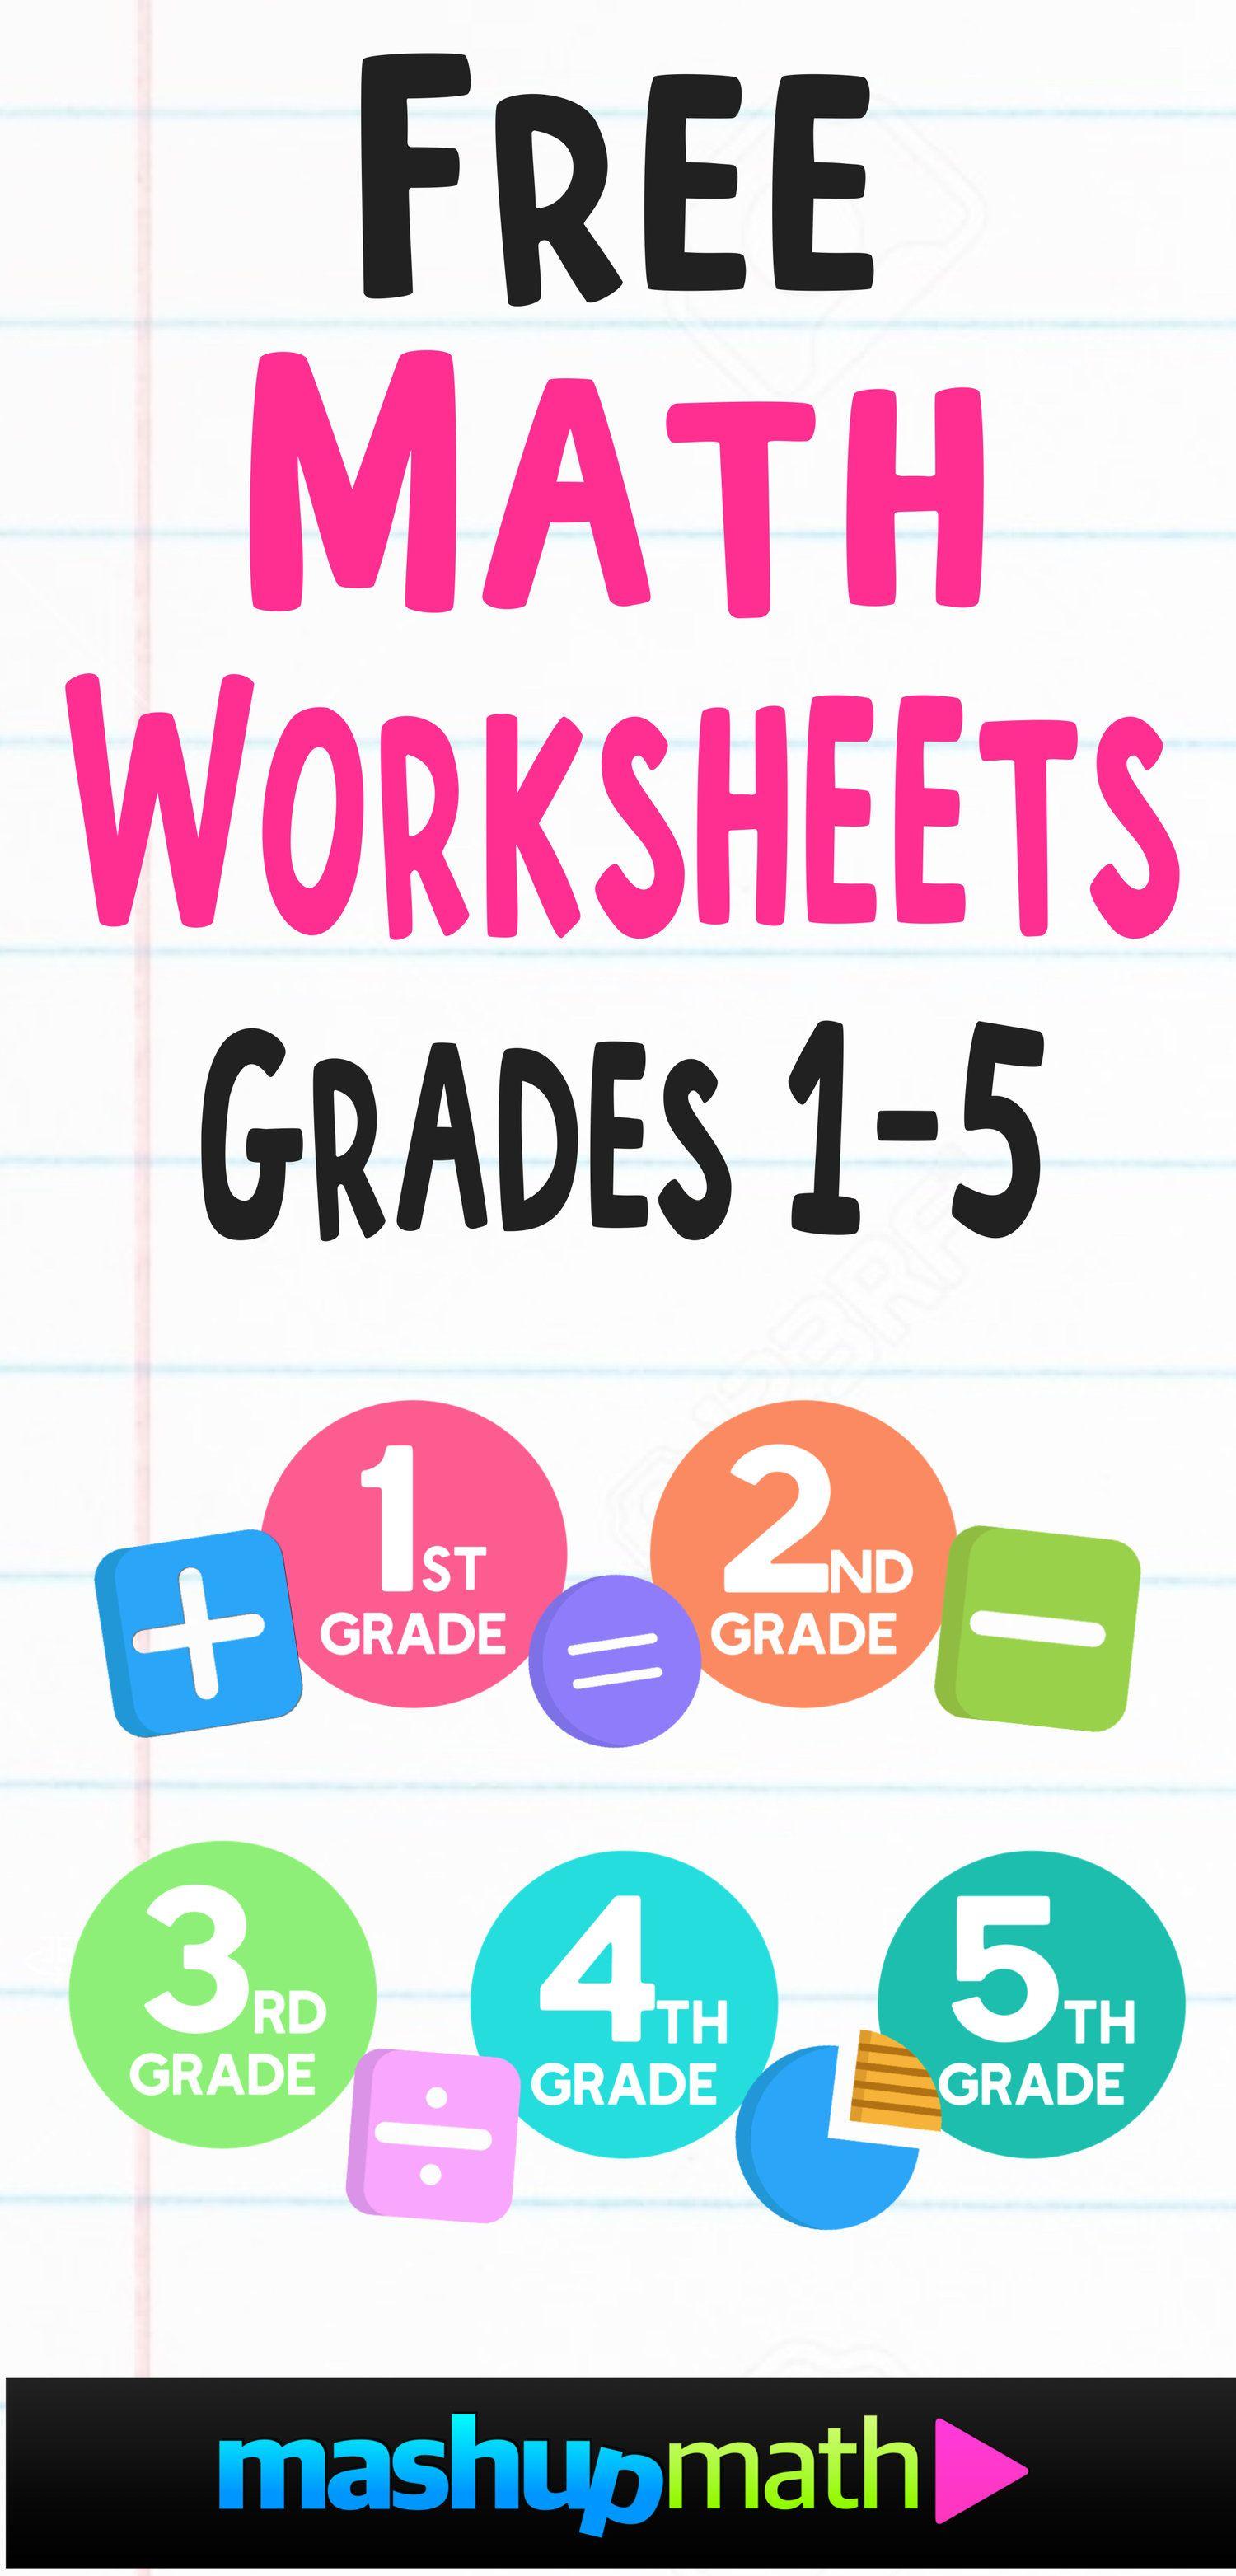 Free Math Worksheets Mashup Math